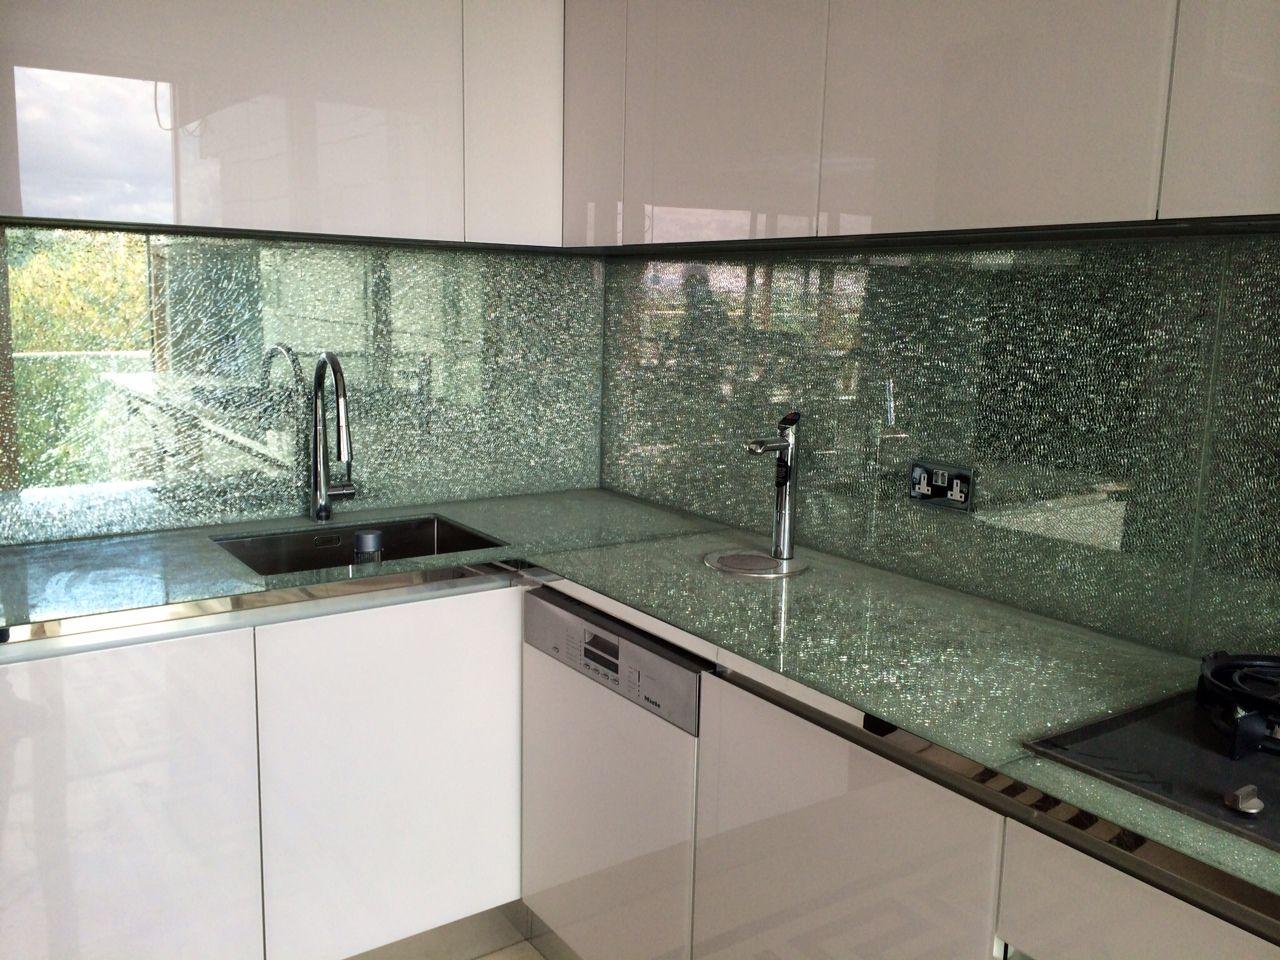 Crackled Glass Splash Backs That Express Toughening Made For A